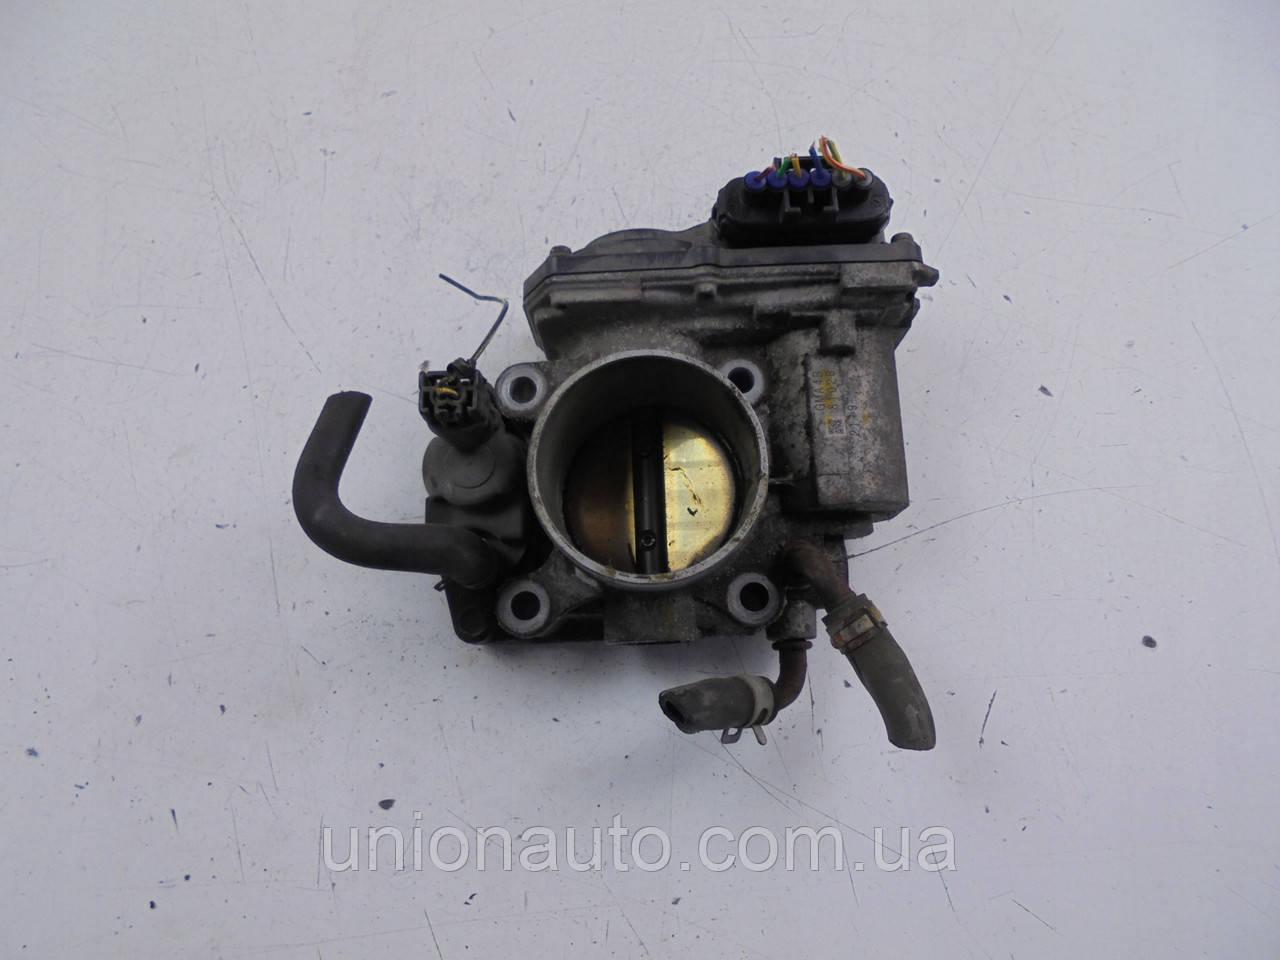 Дроссельная заслонка HONDA FR-V FRV 1.8 I-VTEC